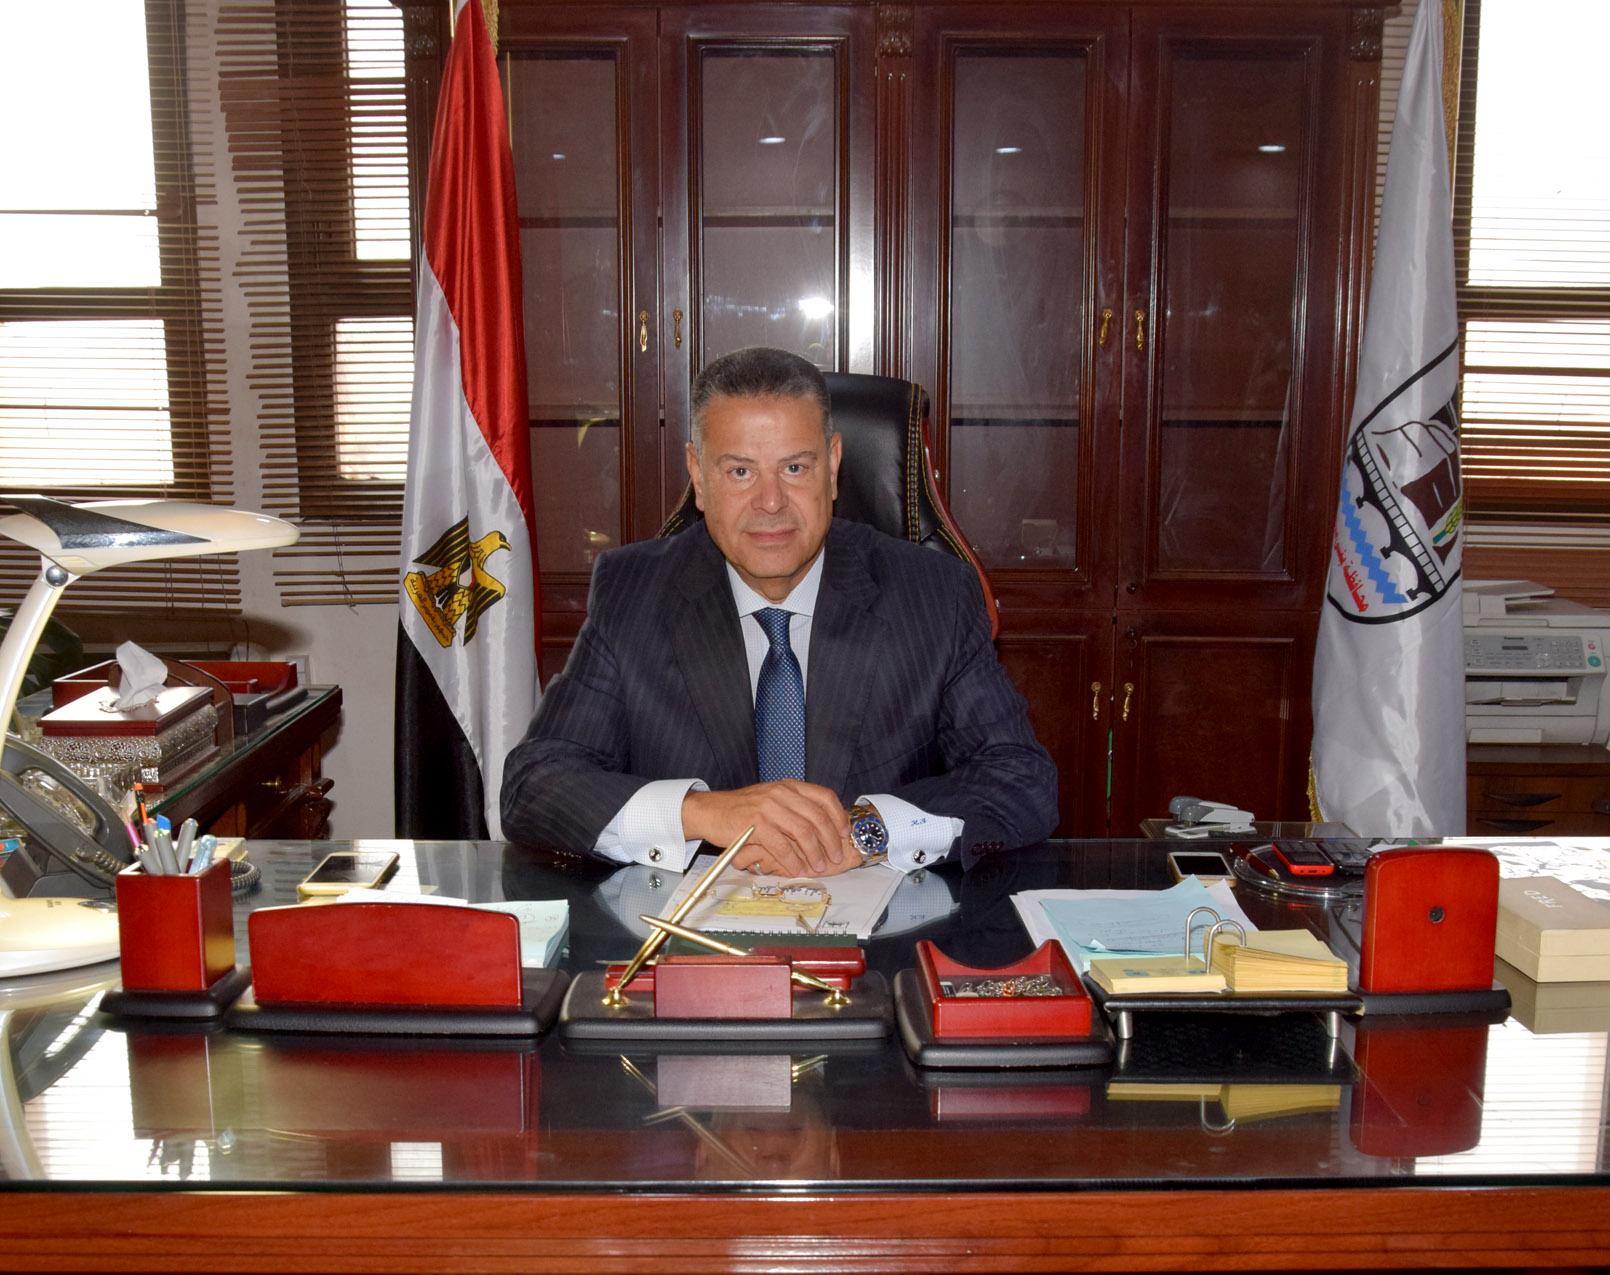 محافظ بنى سويف : فحص مليون و92 ألف و274 مواطن ضمن مبادرة «100 مليون صحة»